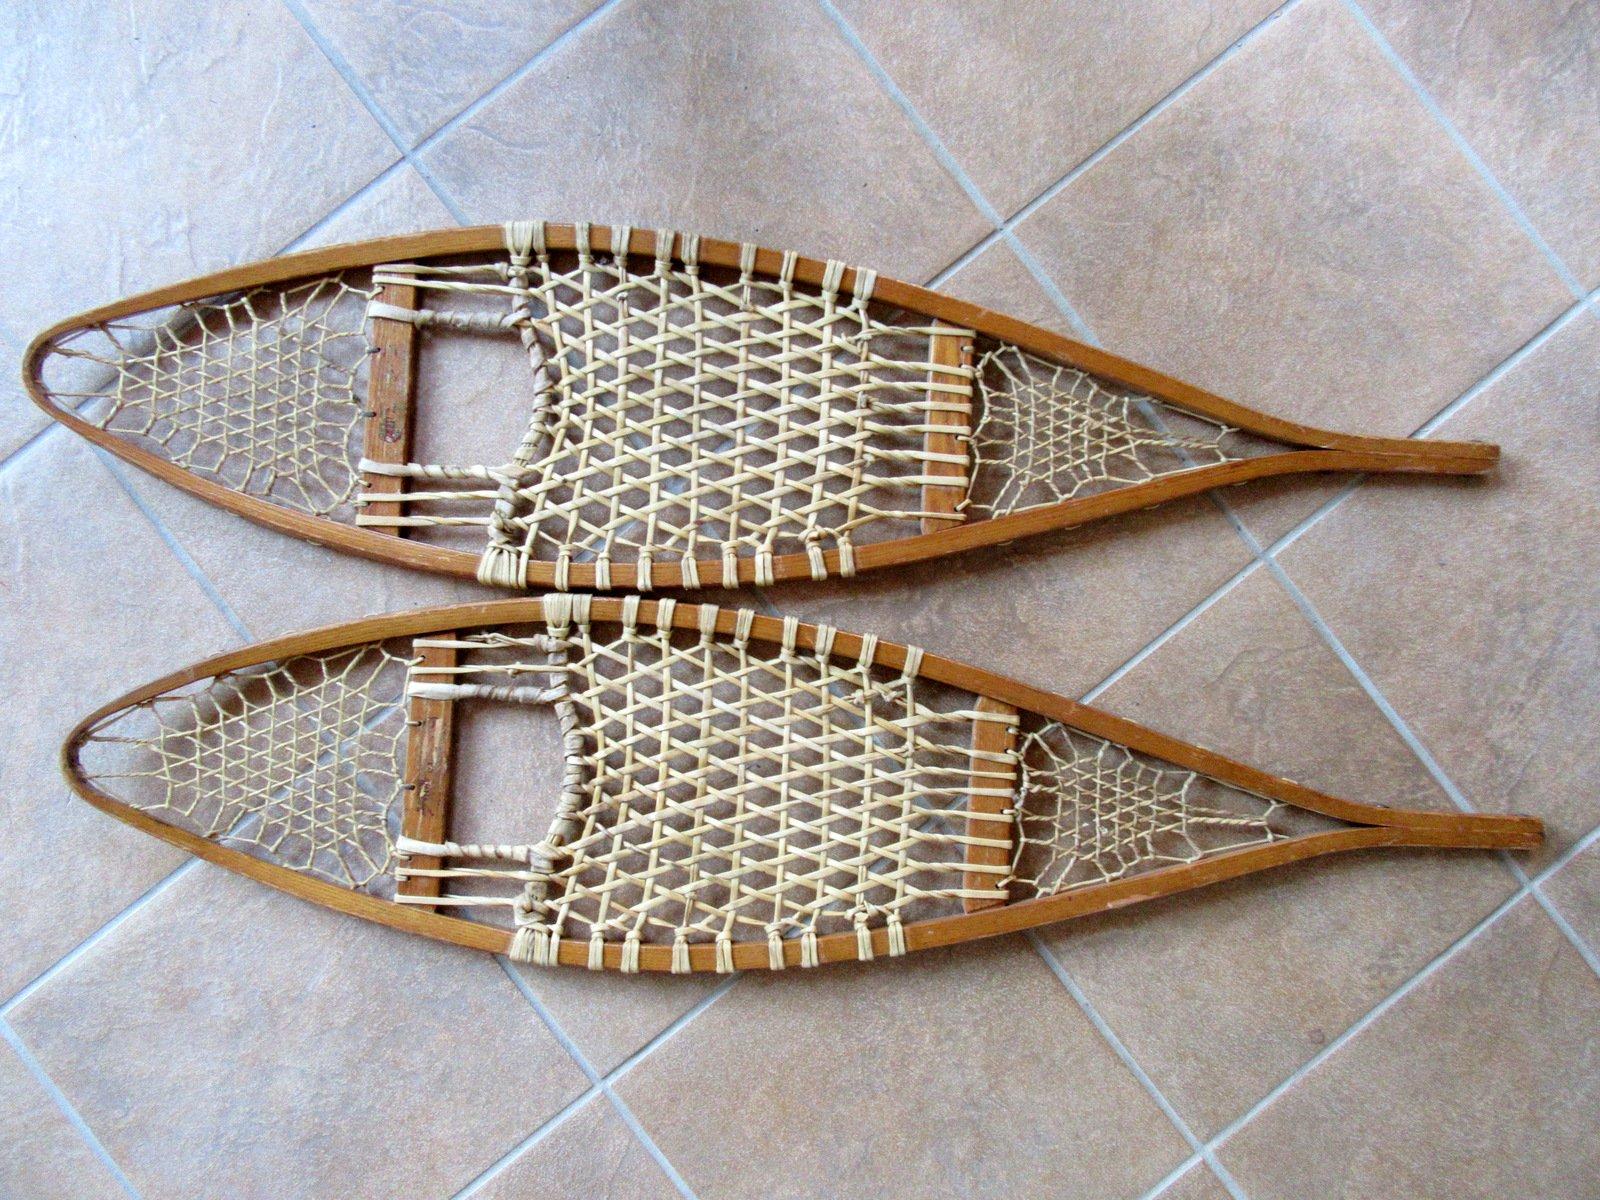 Vintage Wood Snowshoes 10 x 41 Inches https://t.co/2ttVqqCpqv https://t.co/bNuzCa4O7B